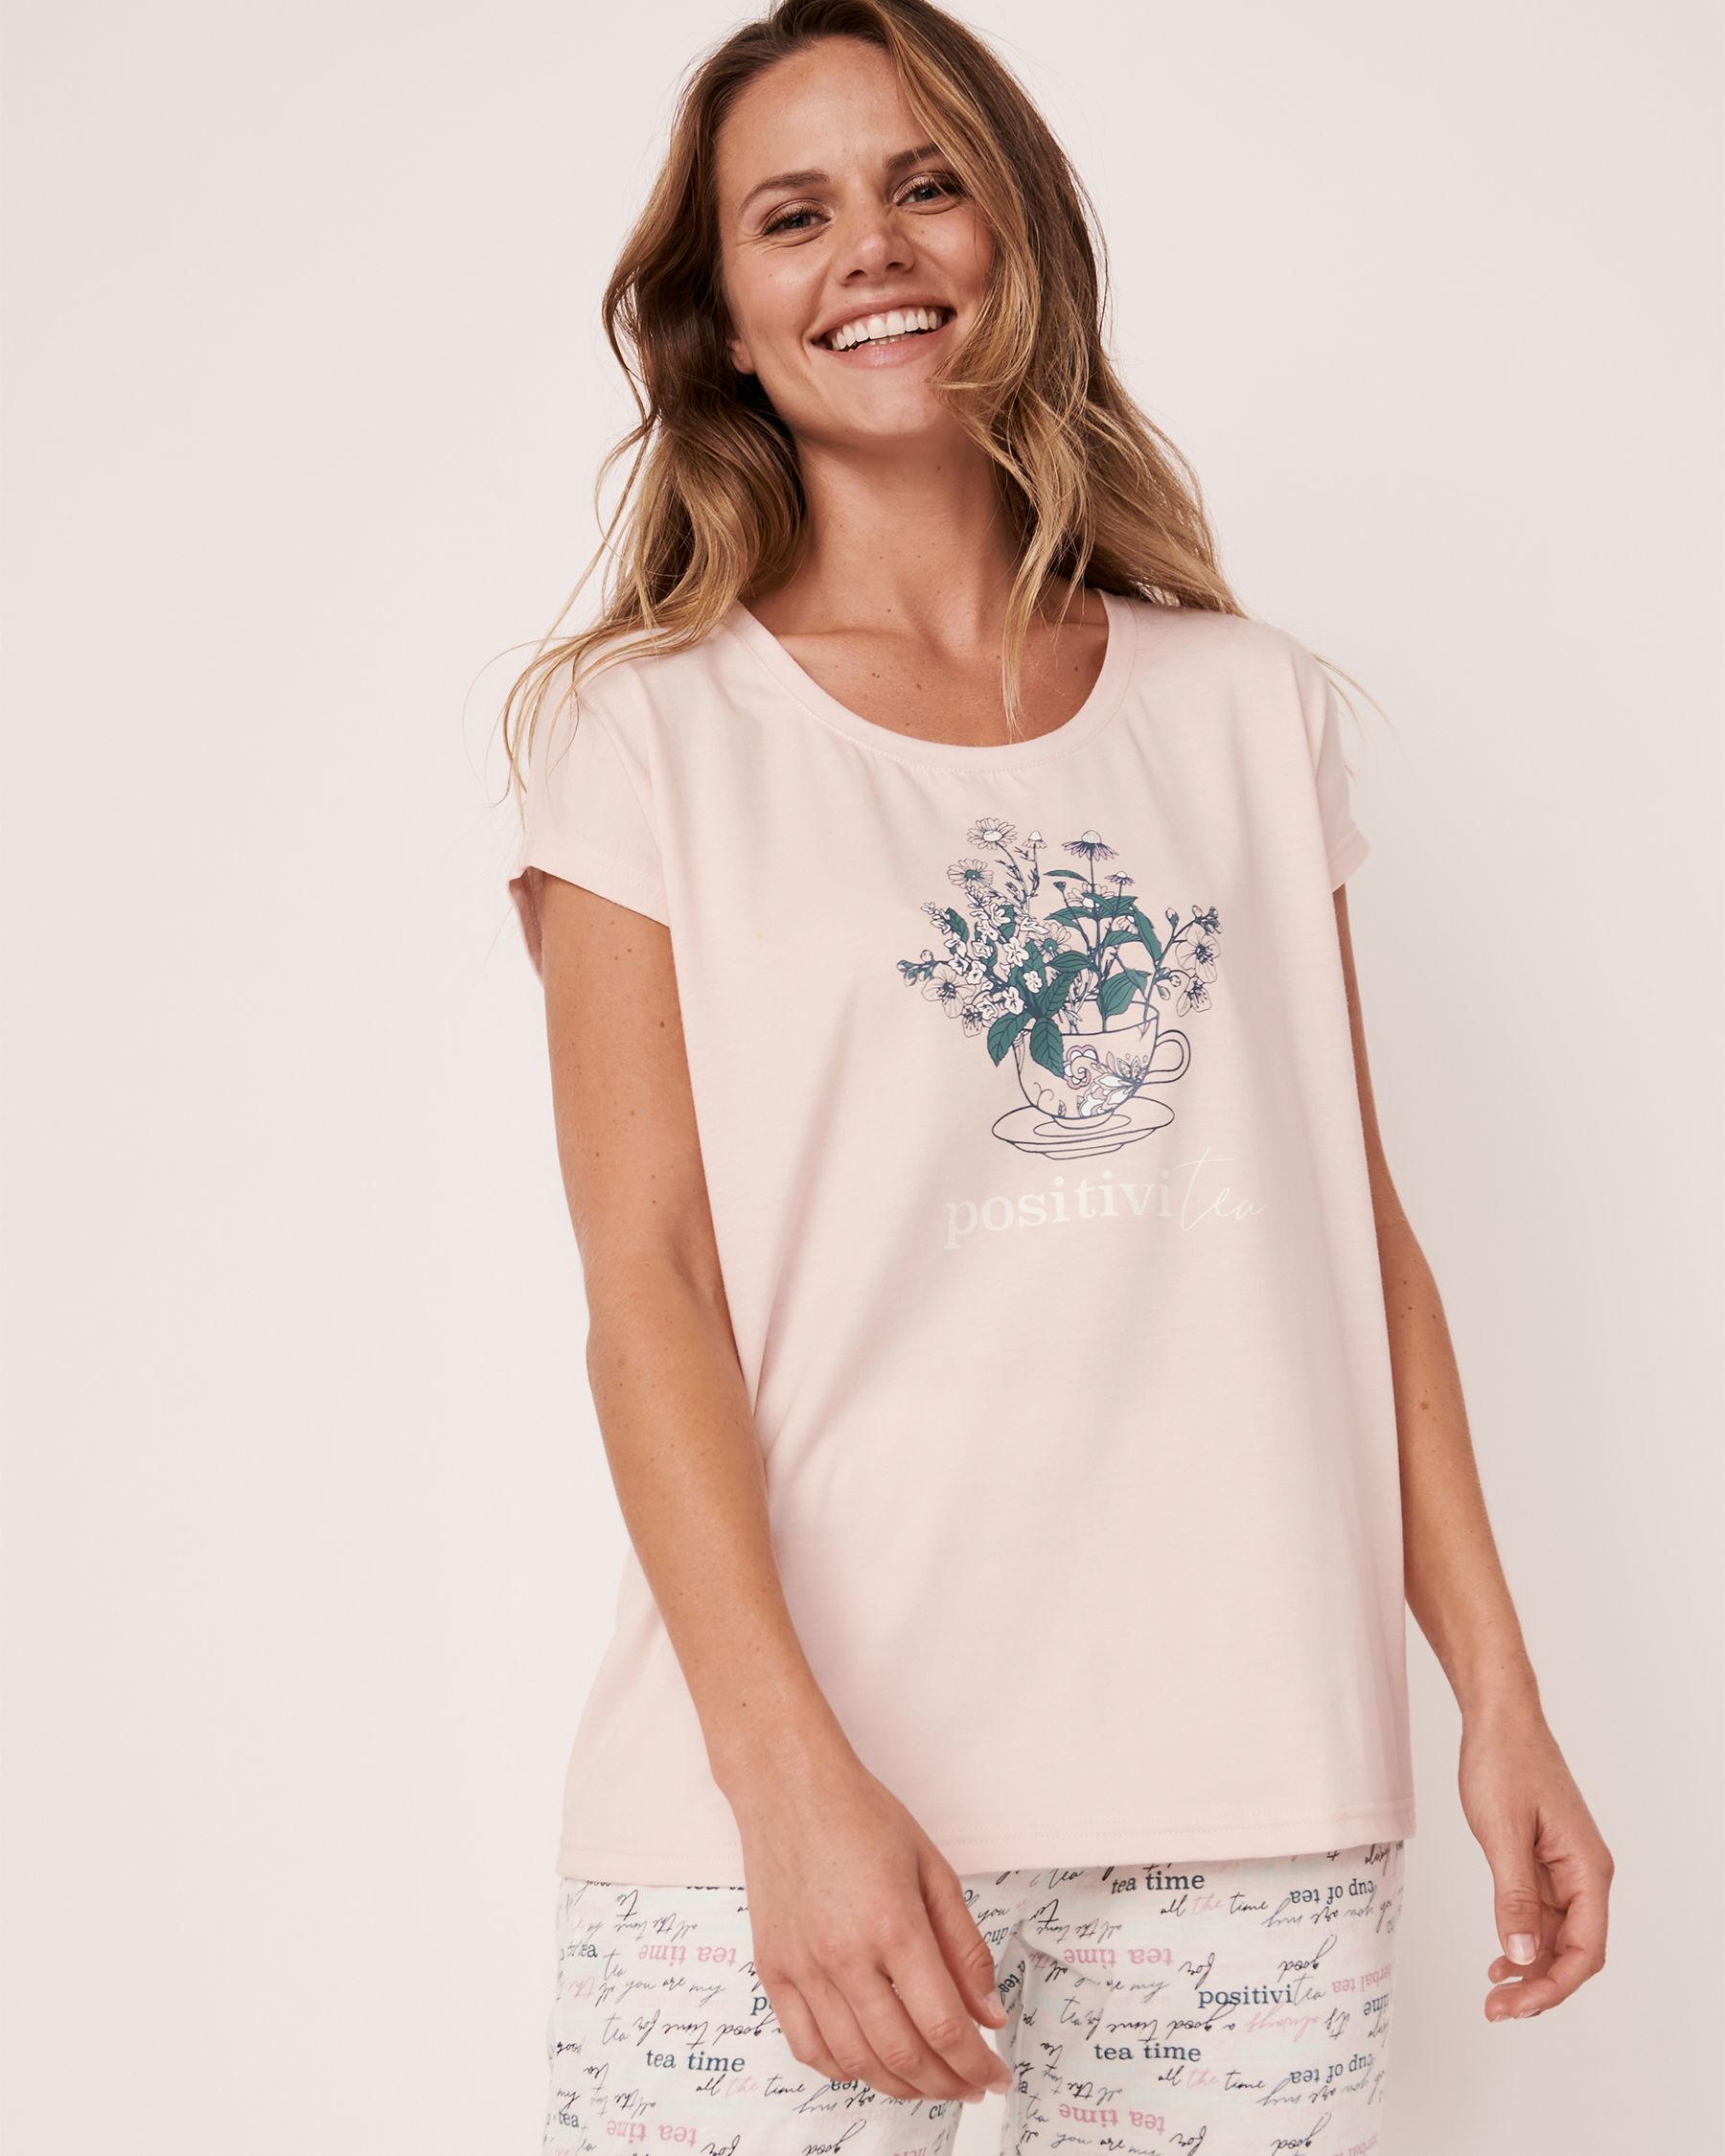 LA VIE EN ROSE Scoop Neck T-shirt Light pink 40100181 - View1